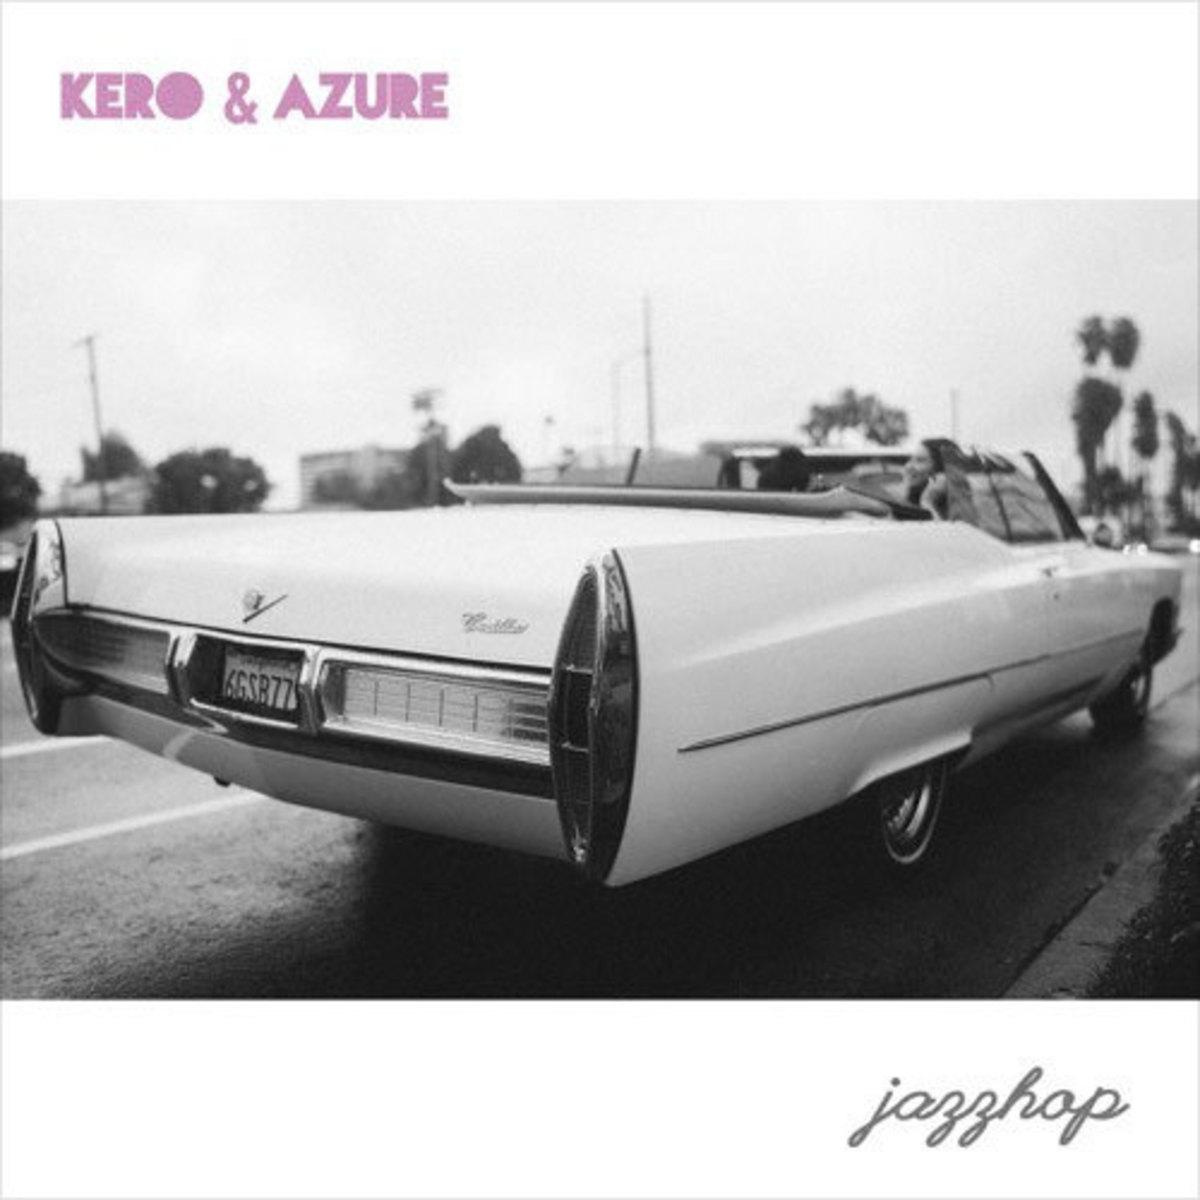 kero-one-azure-jazzhop.jpg